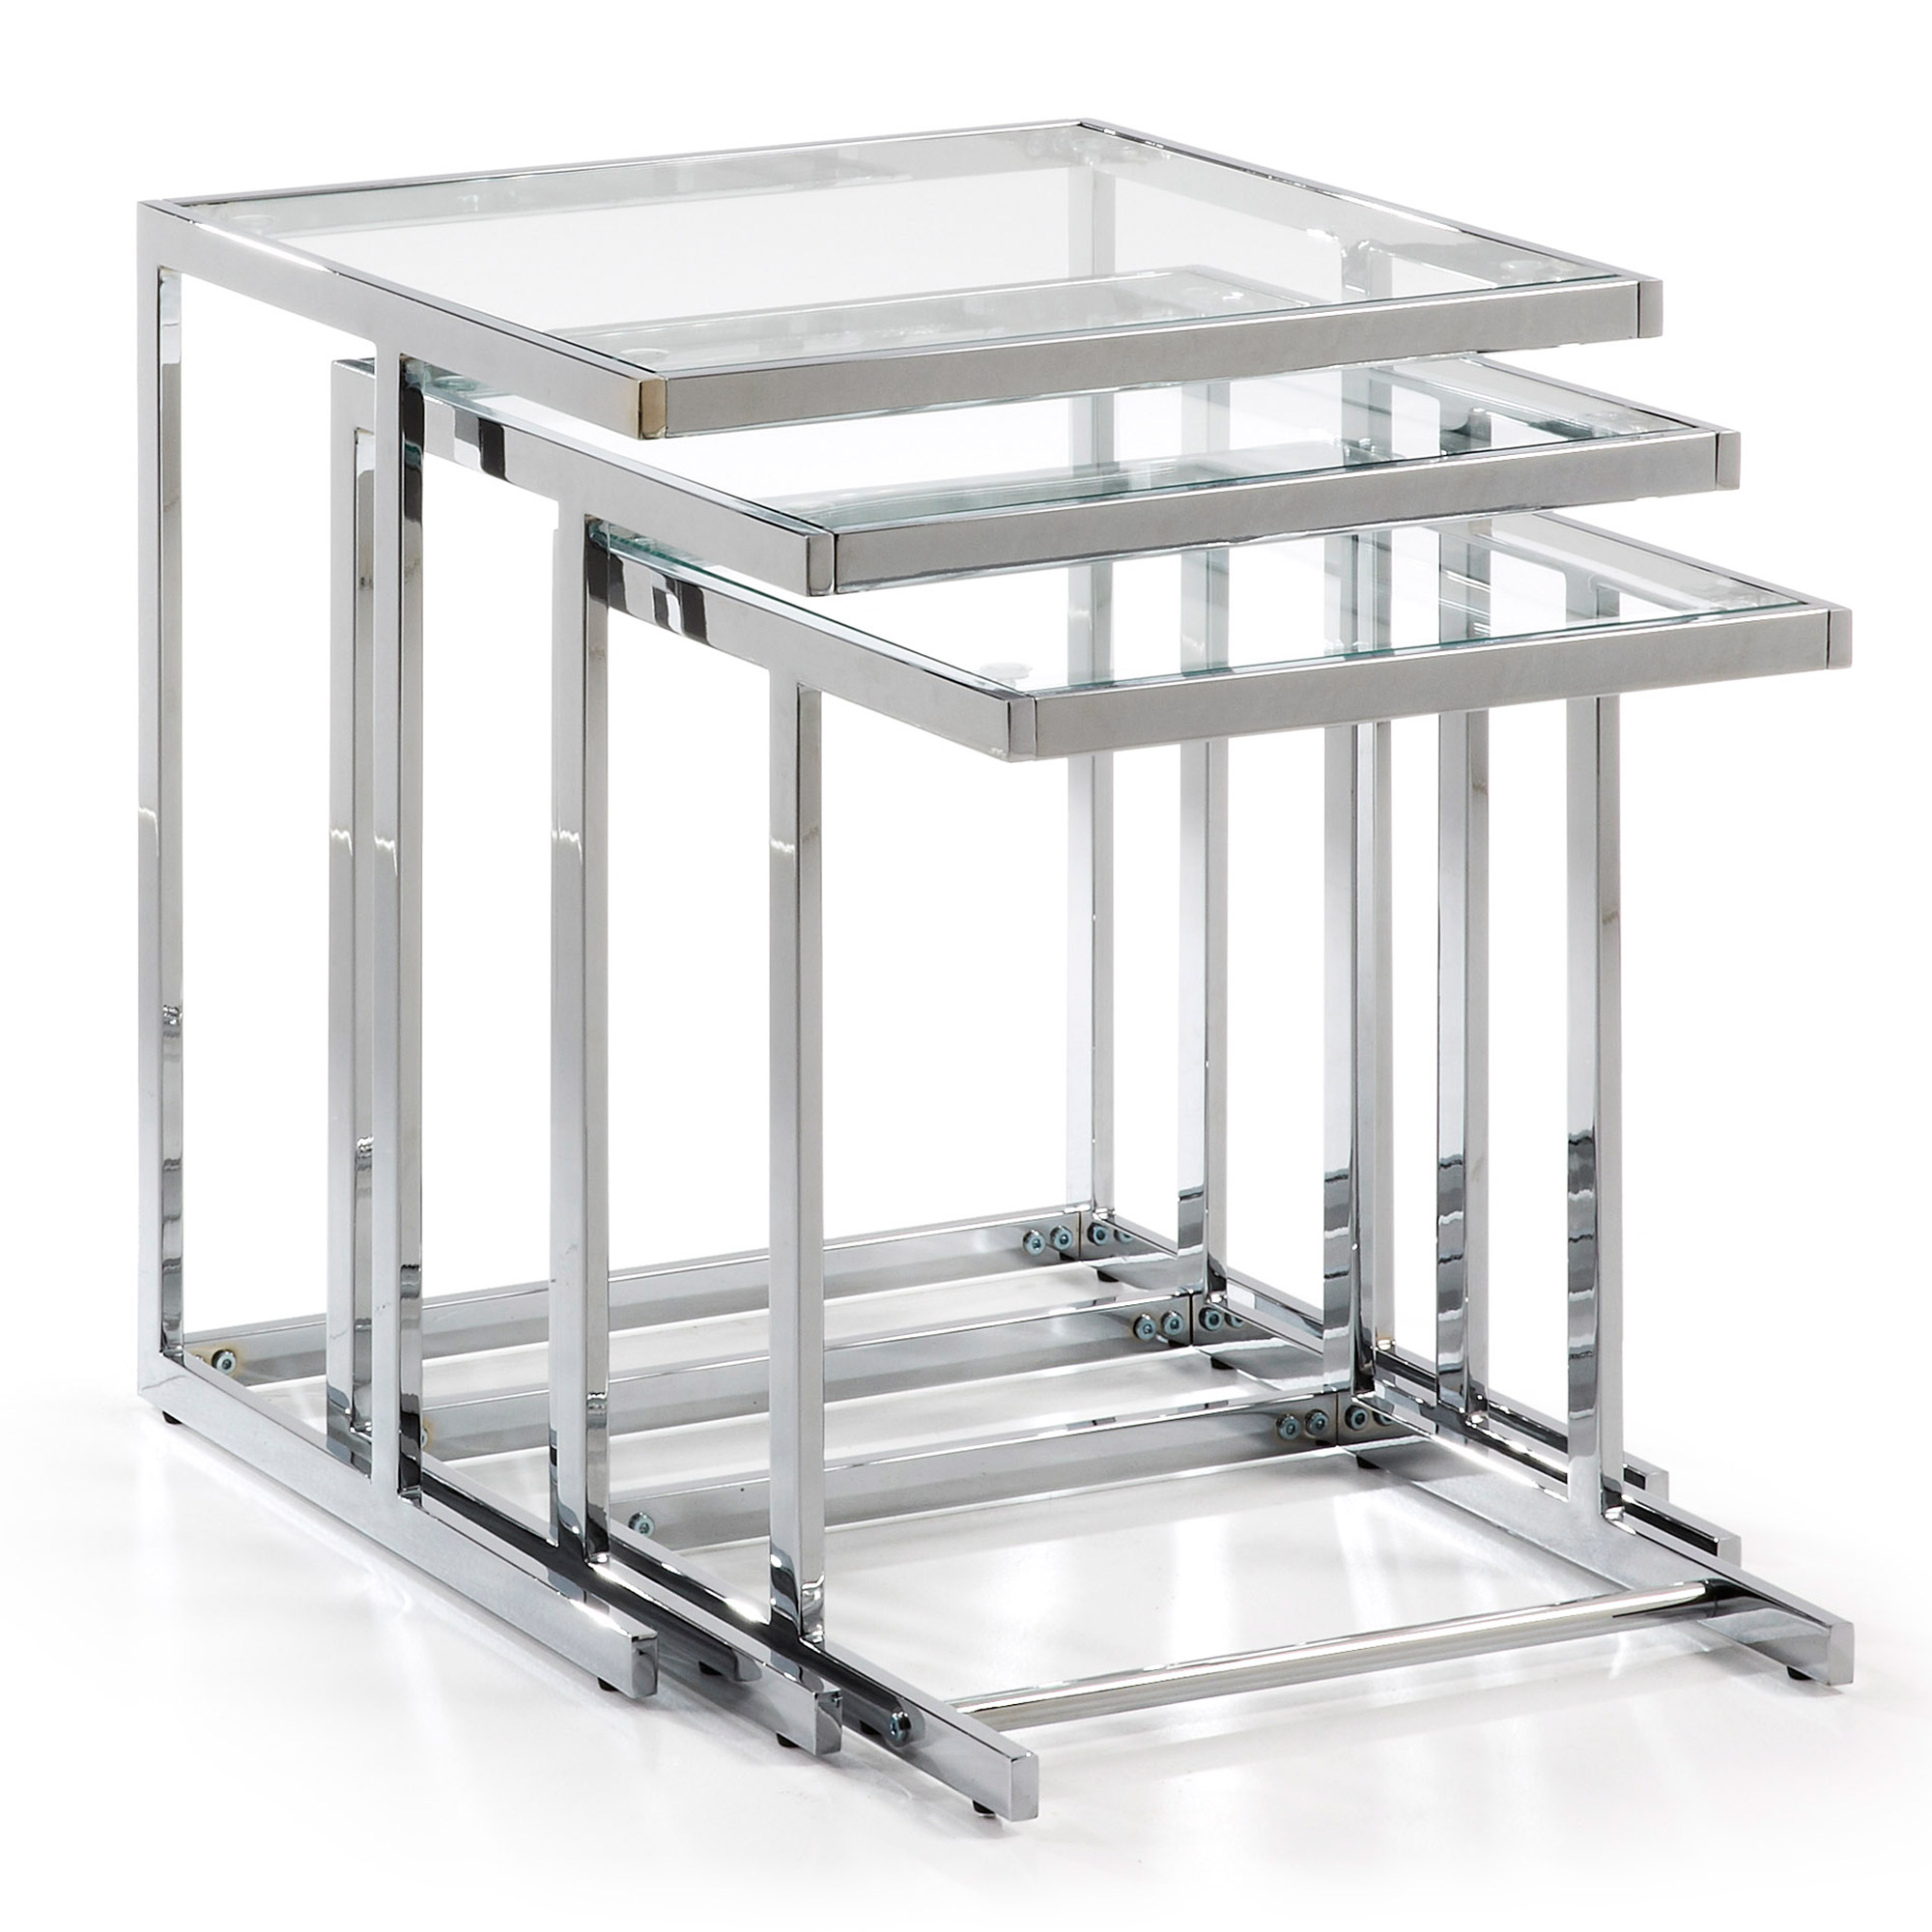 BLAIR set 3 mesas cromado cristal transparente